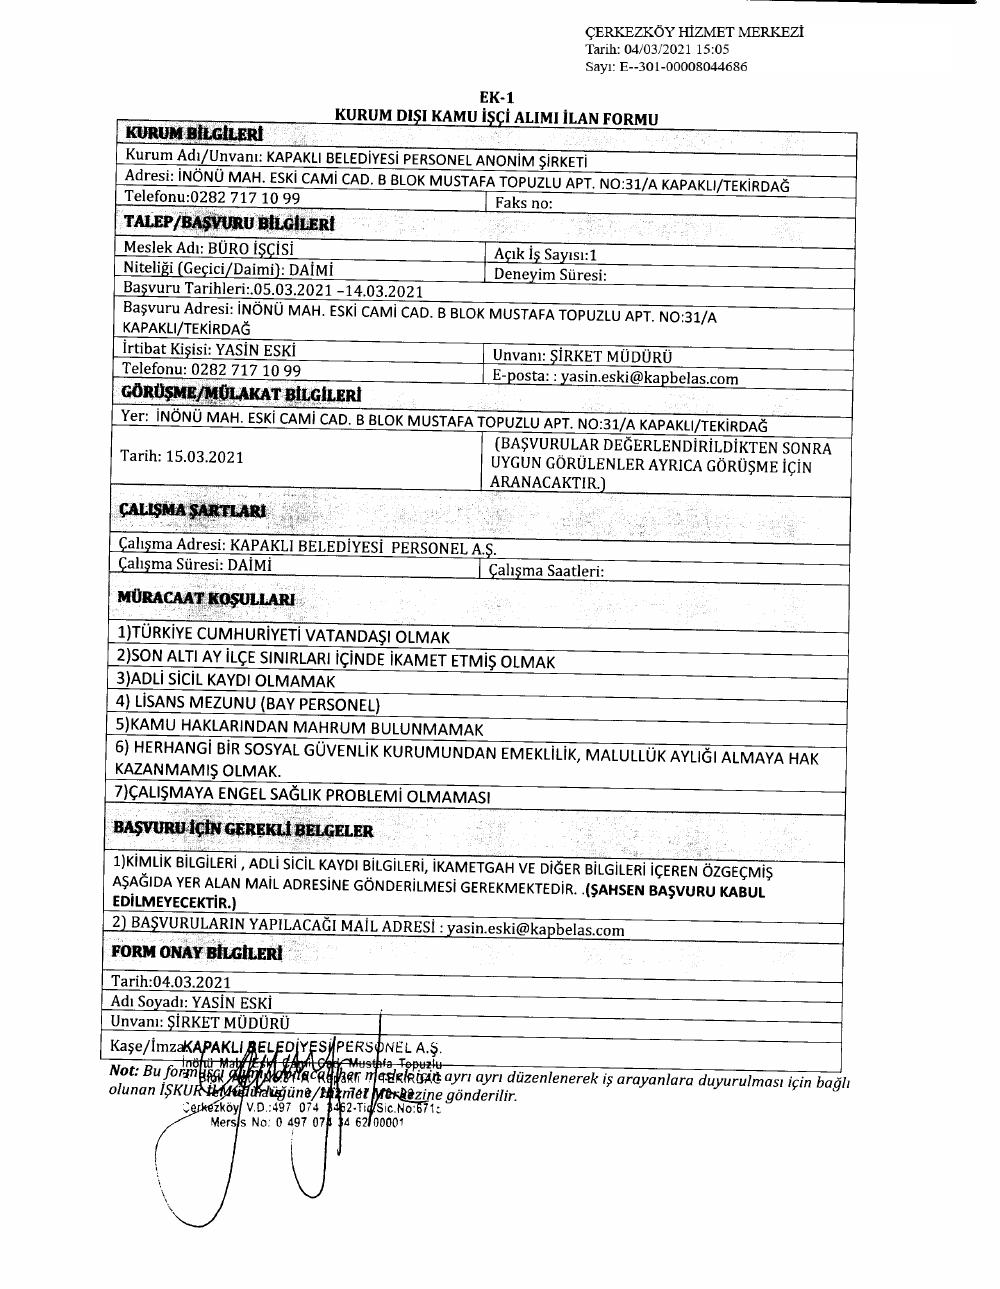 tekirdag-kapakli-belediyesi-personel-a-s-14-03-2021-000003.png